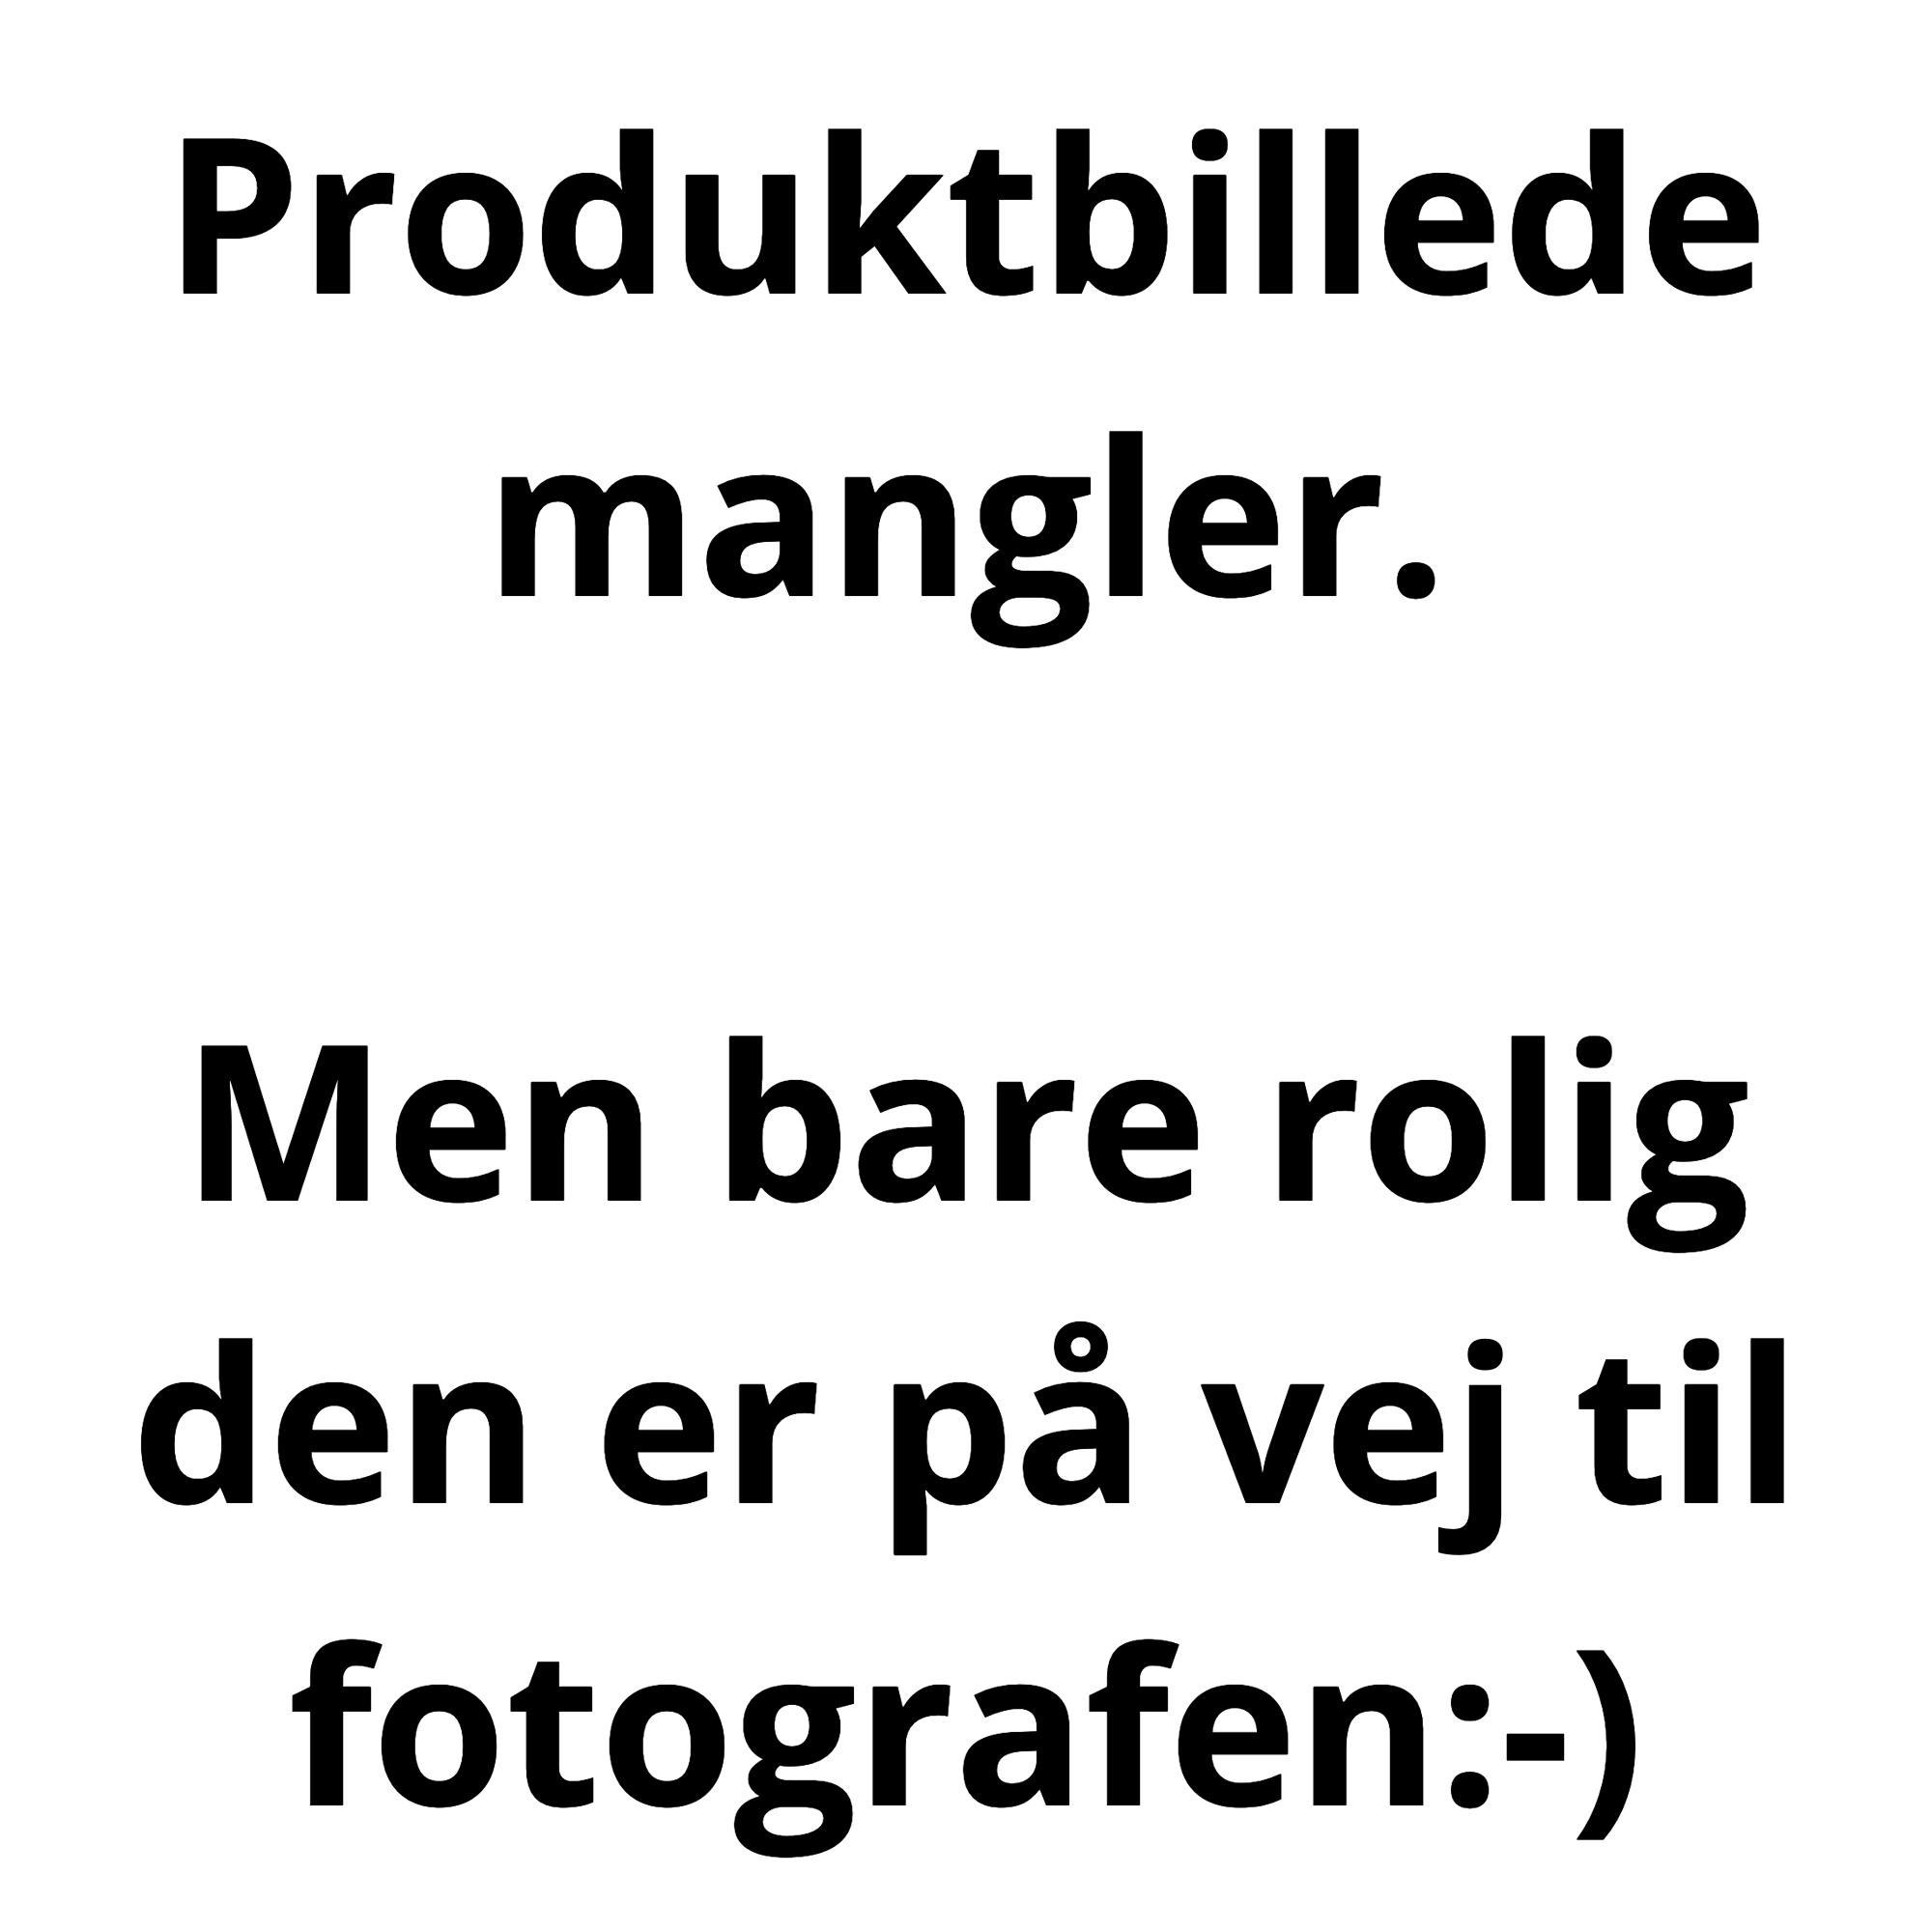 UDGÅET - Bugatti Slimcase Lomme Str. S - Original